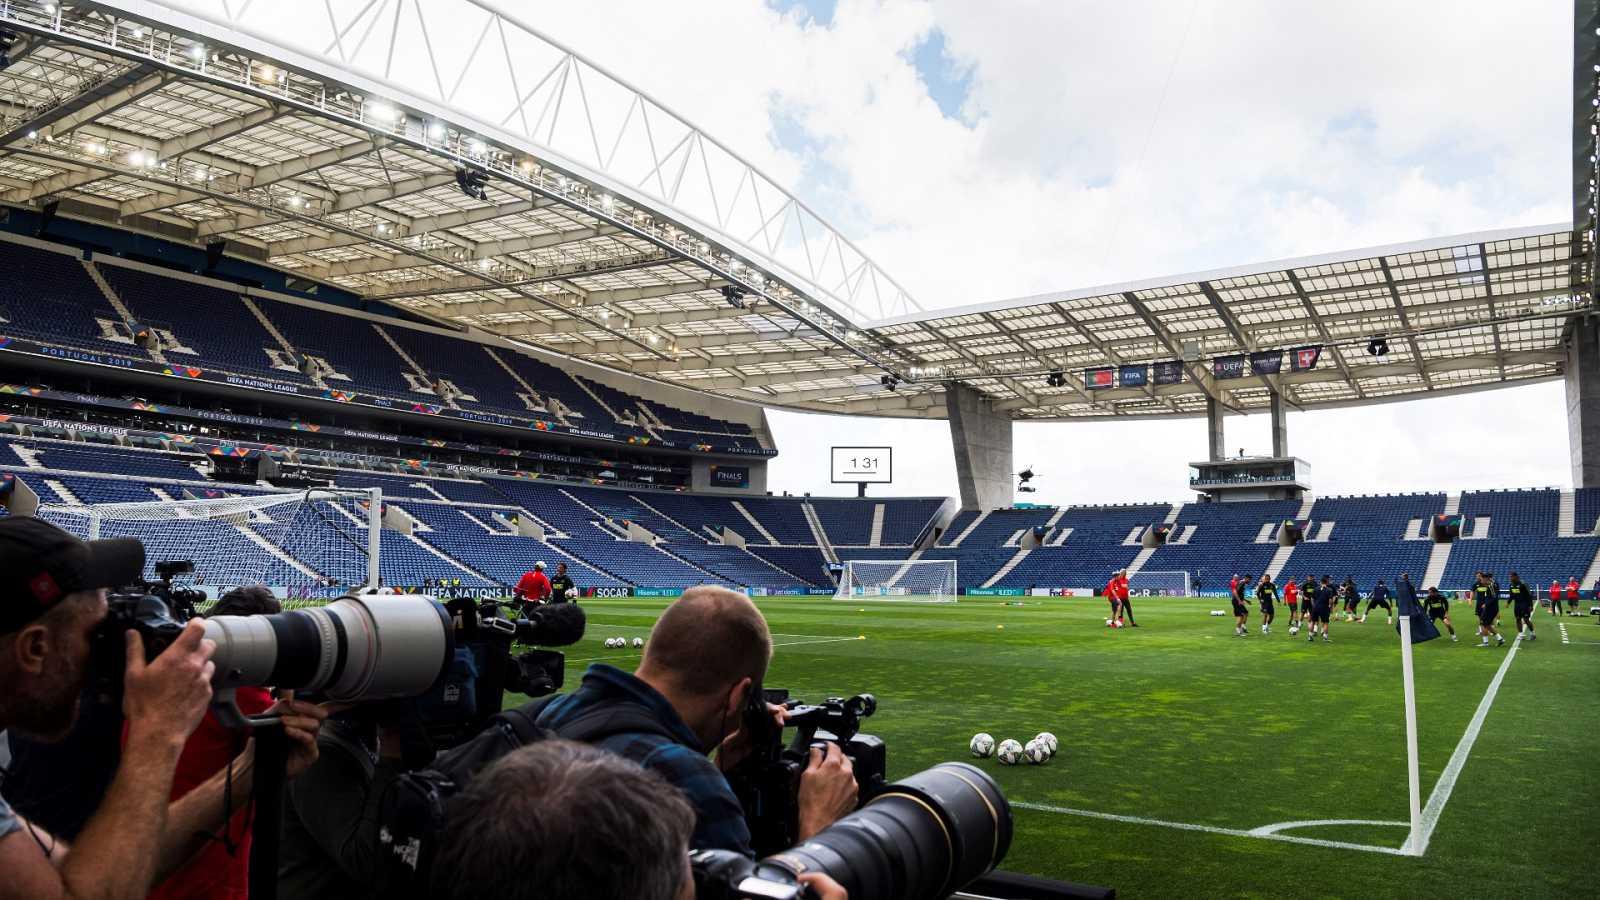 La final de la Champions se disputará en do Dragao, Oporto